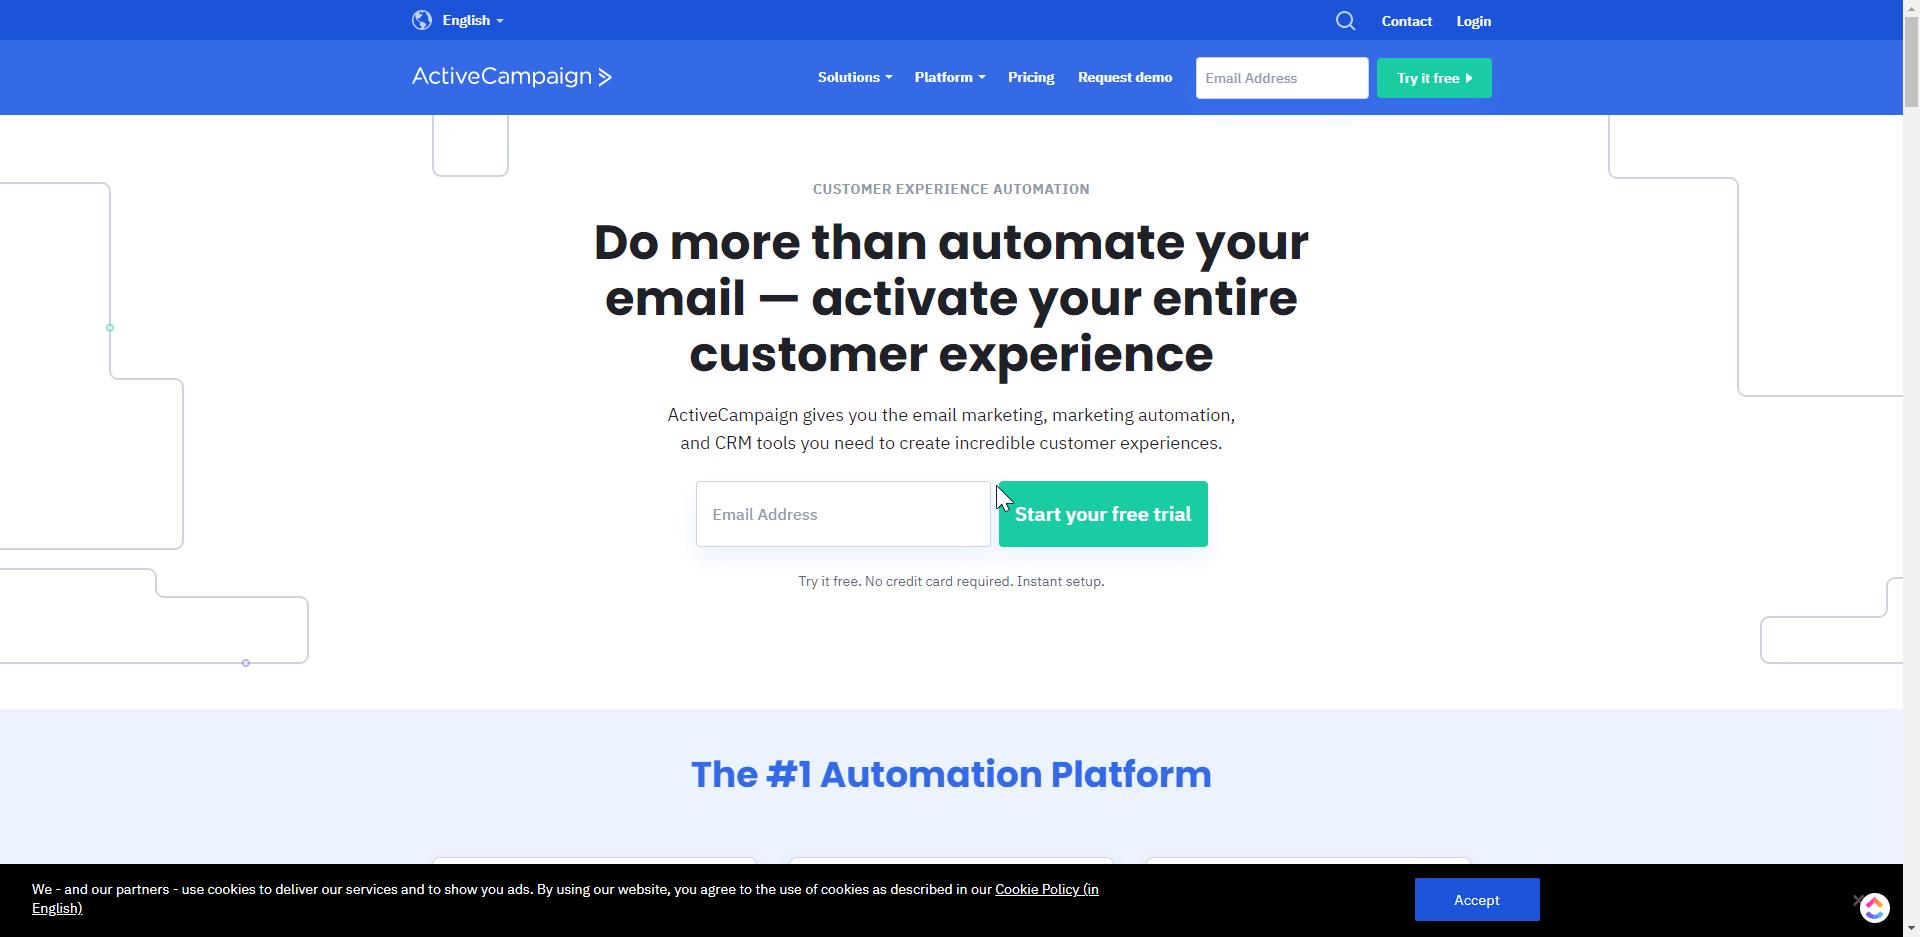 ActiveCampaign Value proposition hero